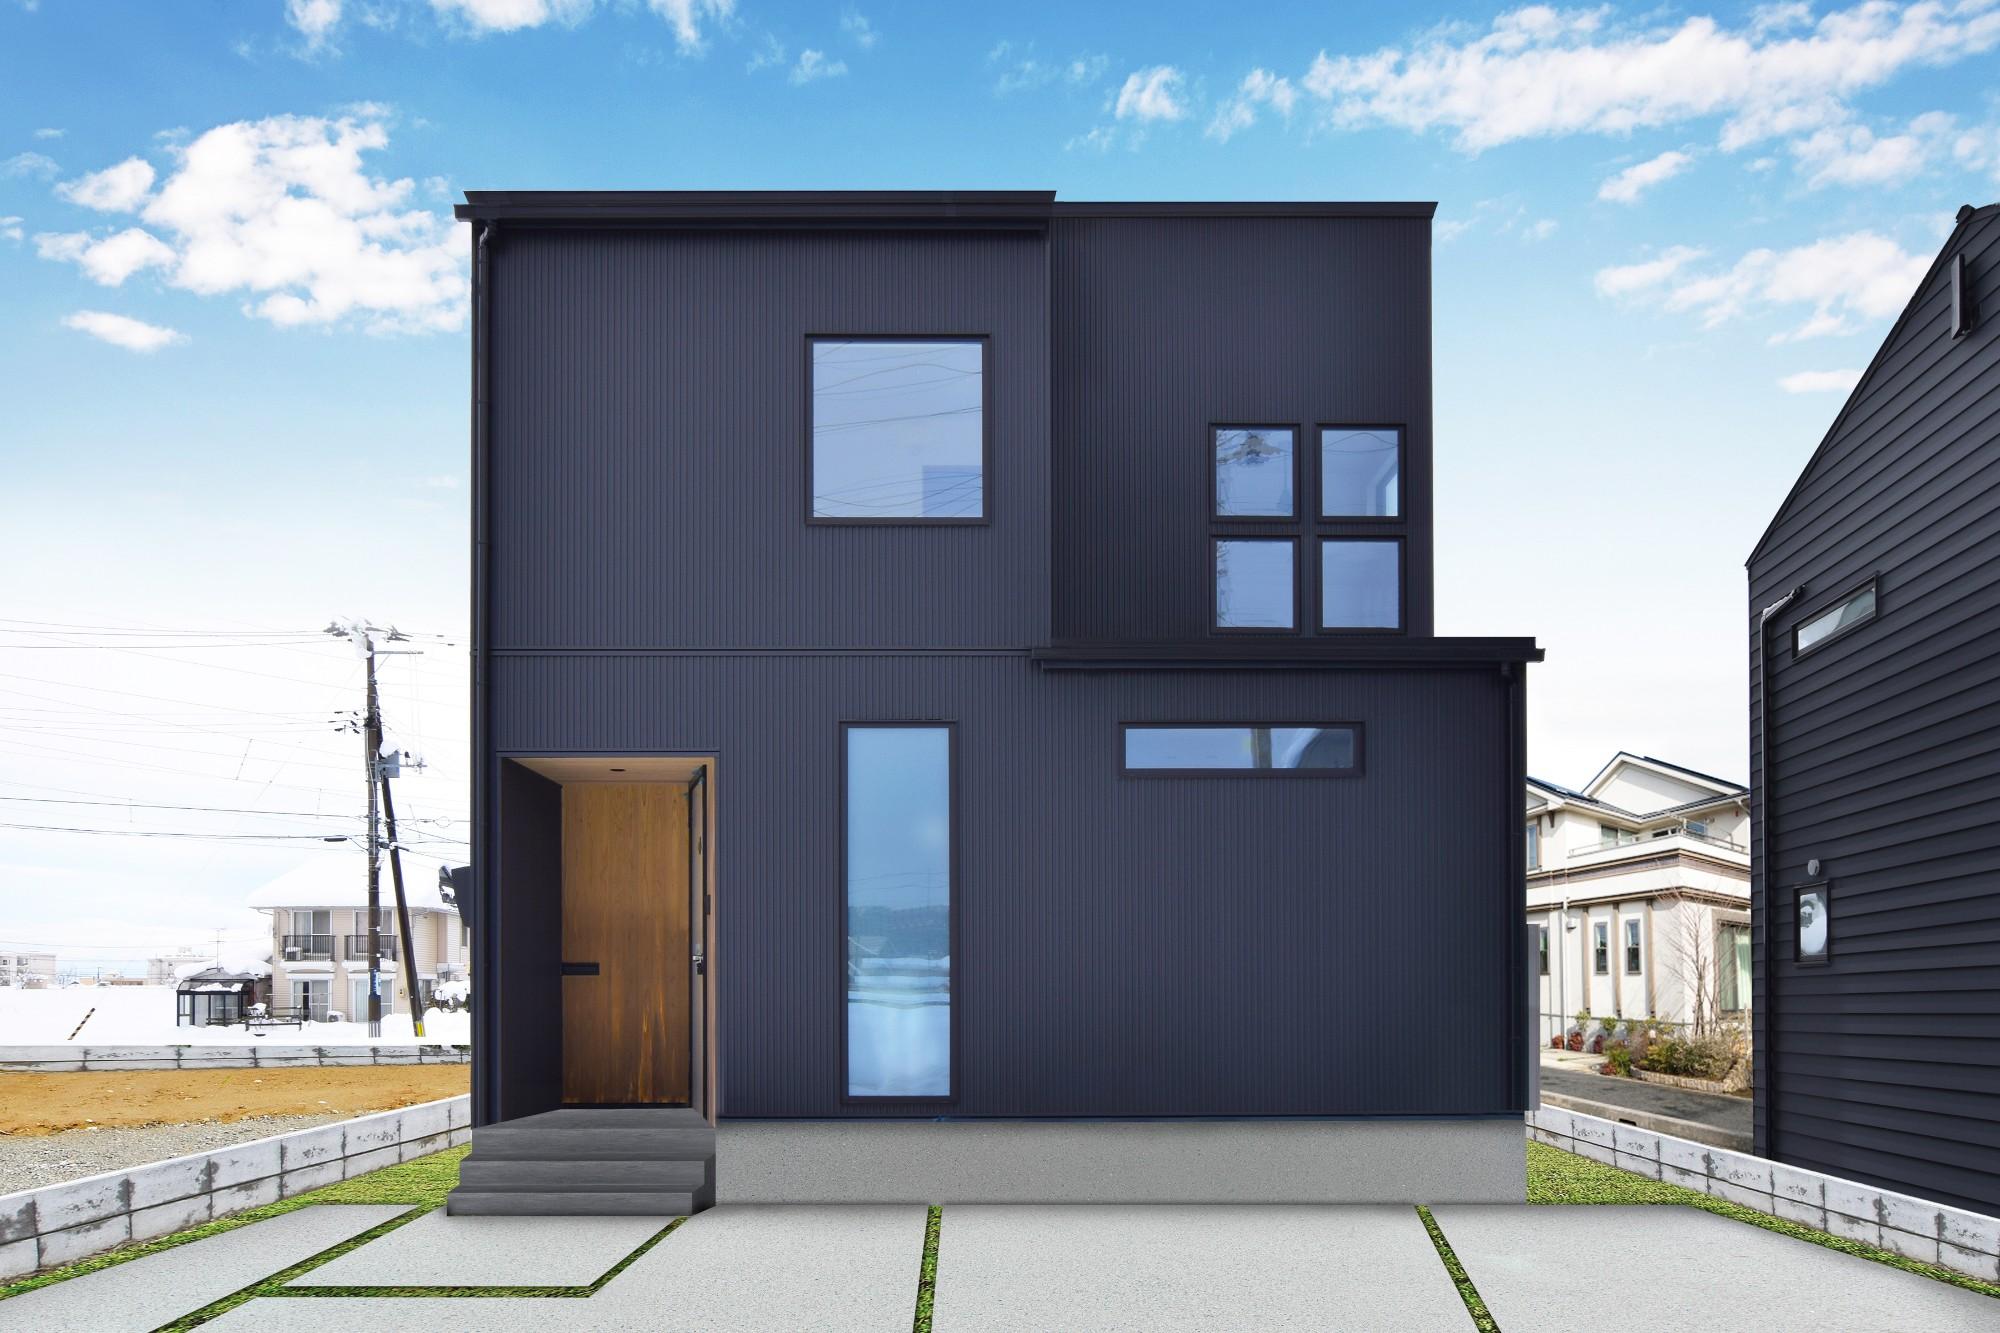 DETAIL HOME(ディテールホーム)「光が降りそそぐ開放感のある家」のシンプル・ナチュラルな外観の実例写真